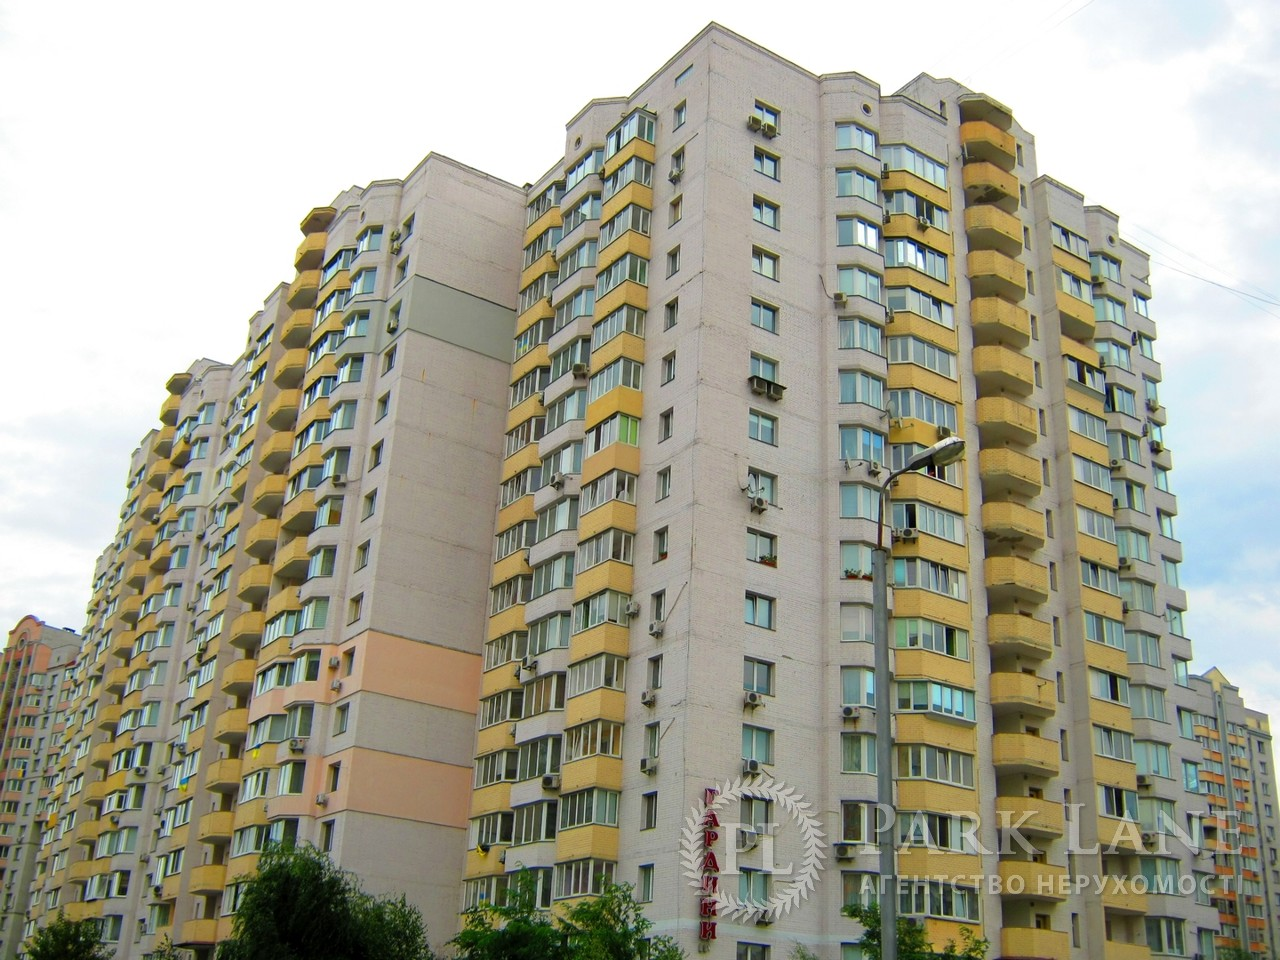 Квартира Z-1151426, Ахматовой, 35, Киев - Фото 2